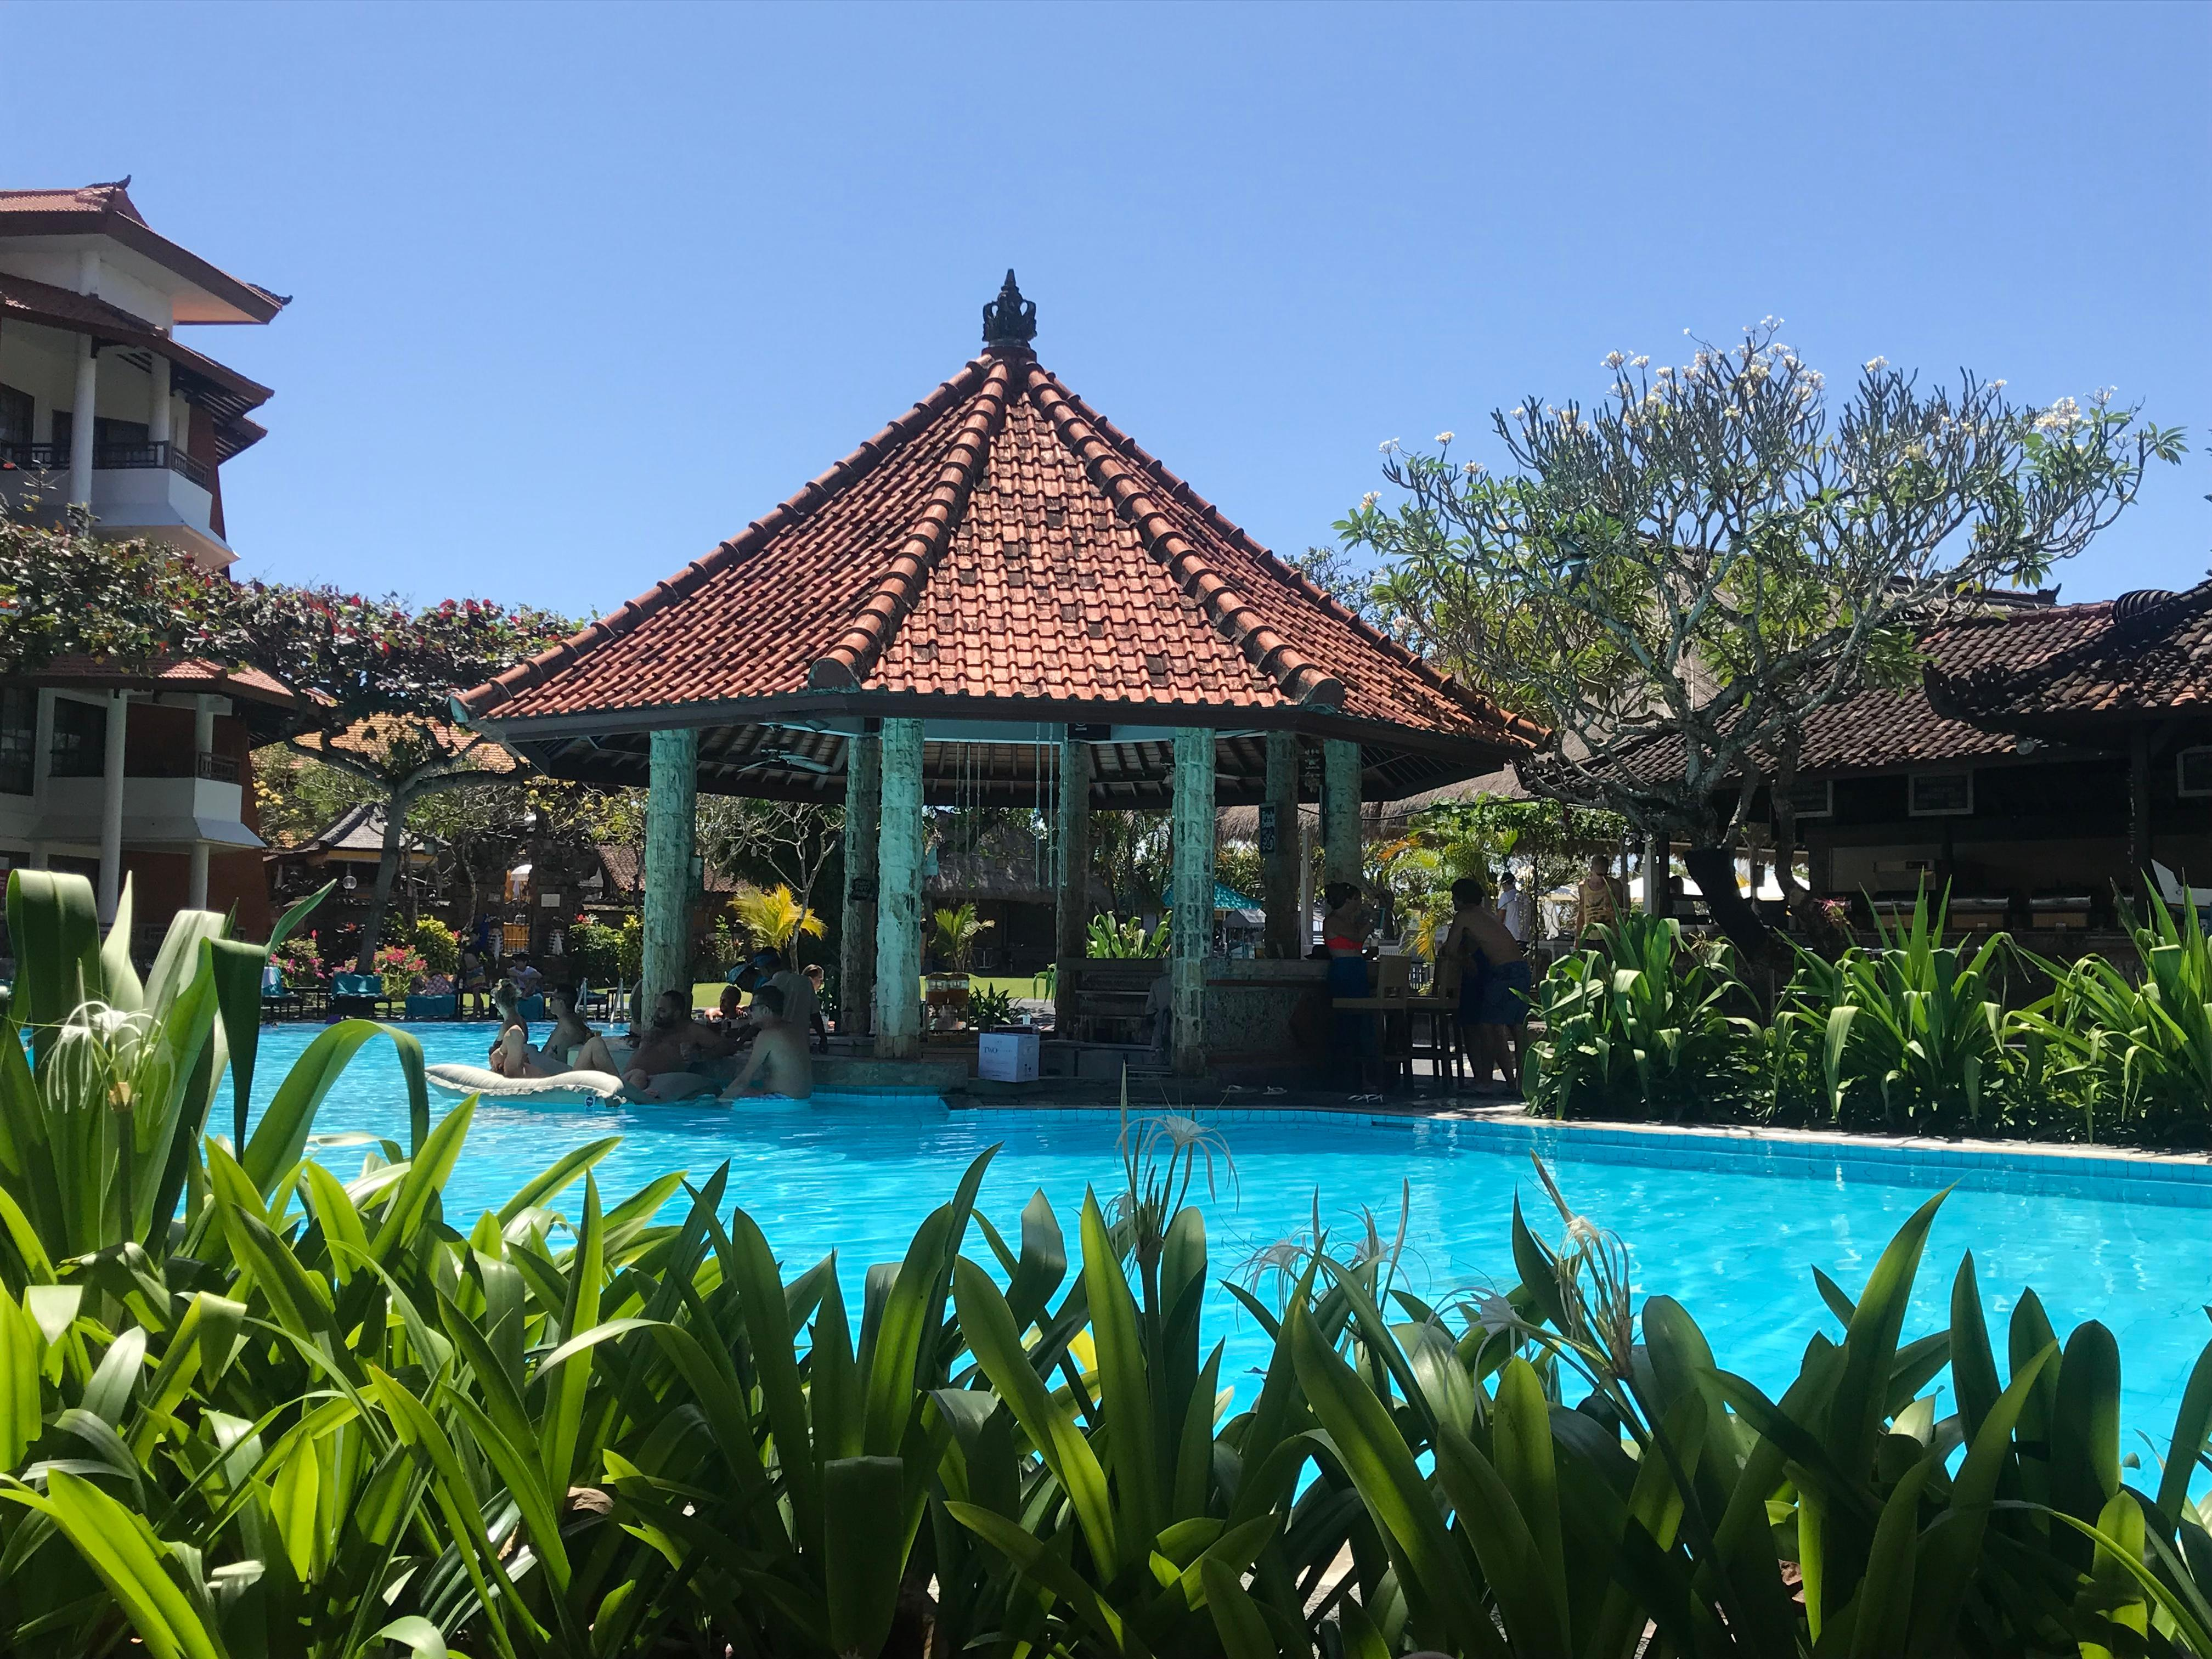 Sol Beach House Bali Benoa Nusa Dua 2019 Room Rates Reviews